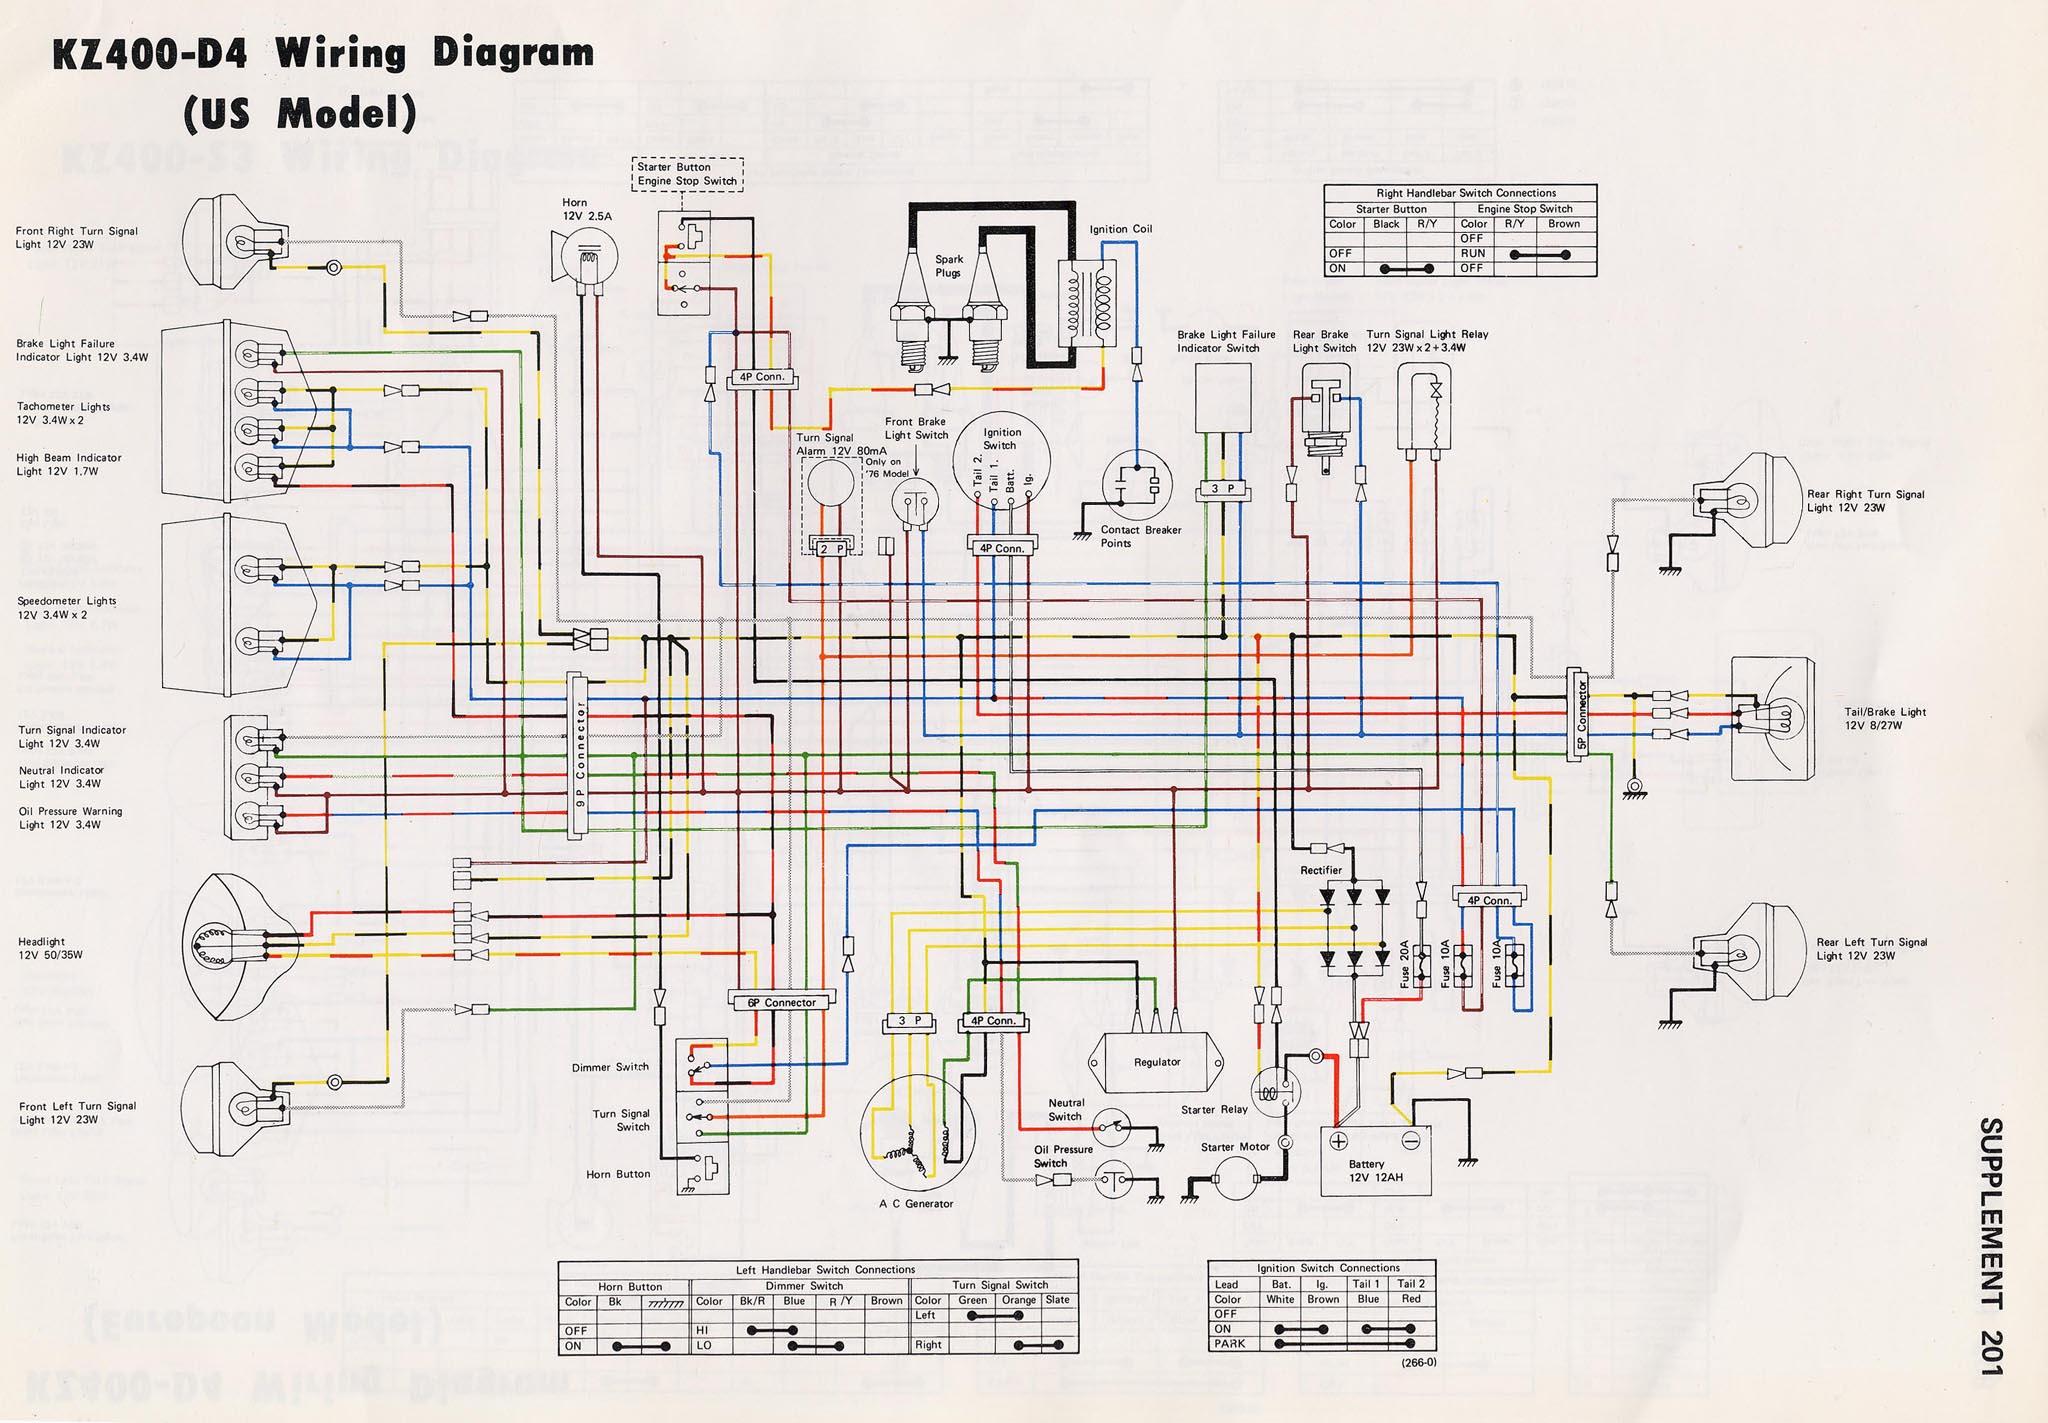 1982 kz1000 wiring diagram 03 jetta 2 0 engine kawasaki kz440 b1 kz700 elsavadorla